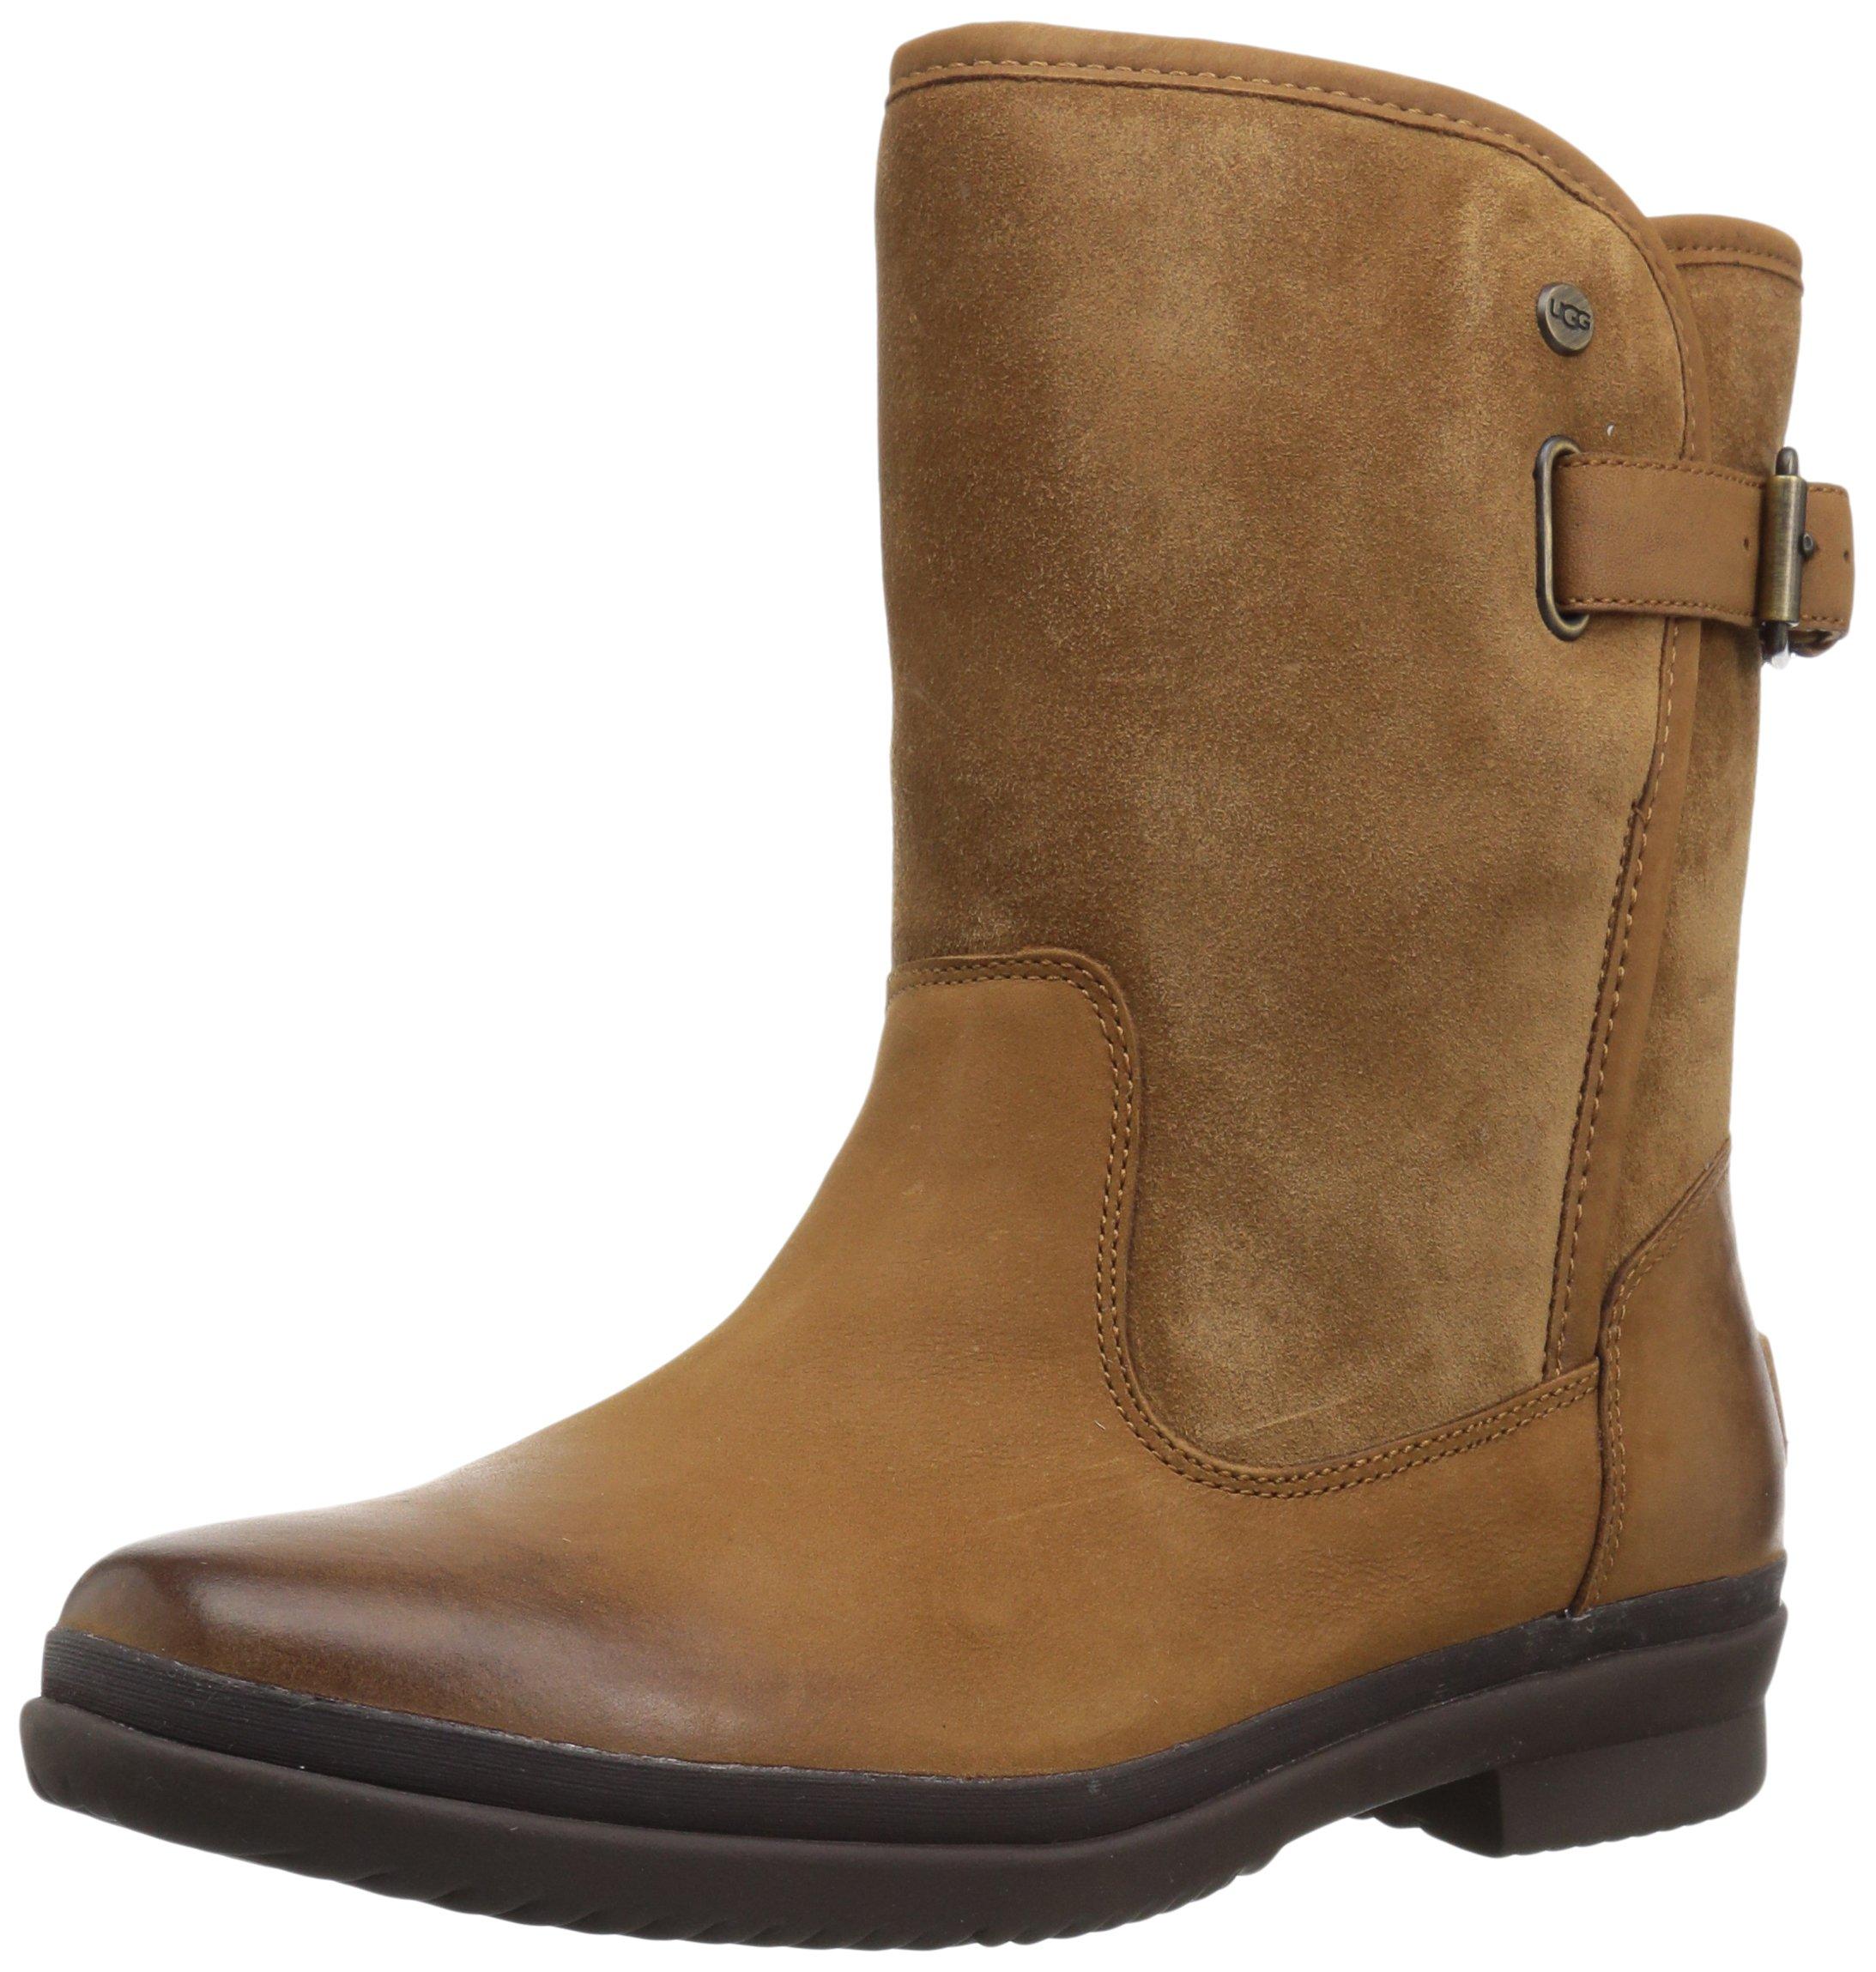 UGG Women's Oren Fashion Boot, Chestnut, 7 M US